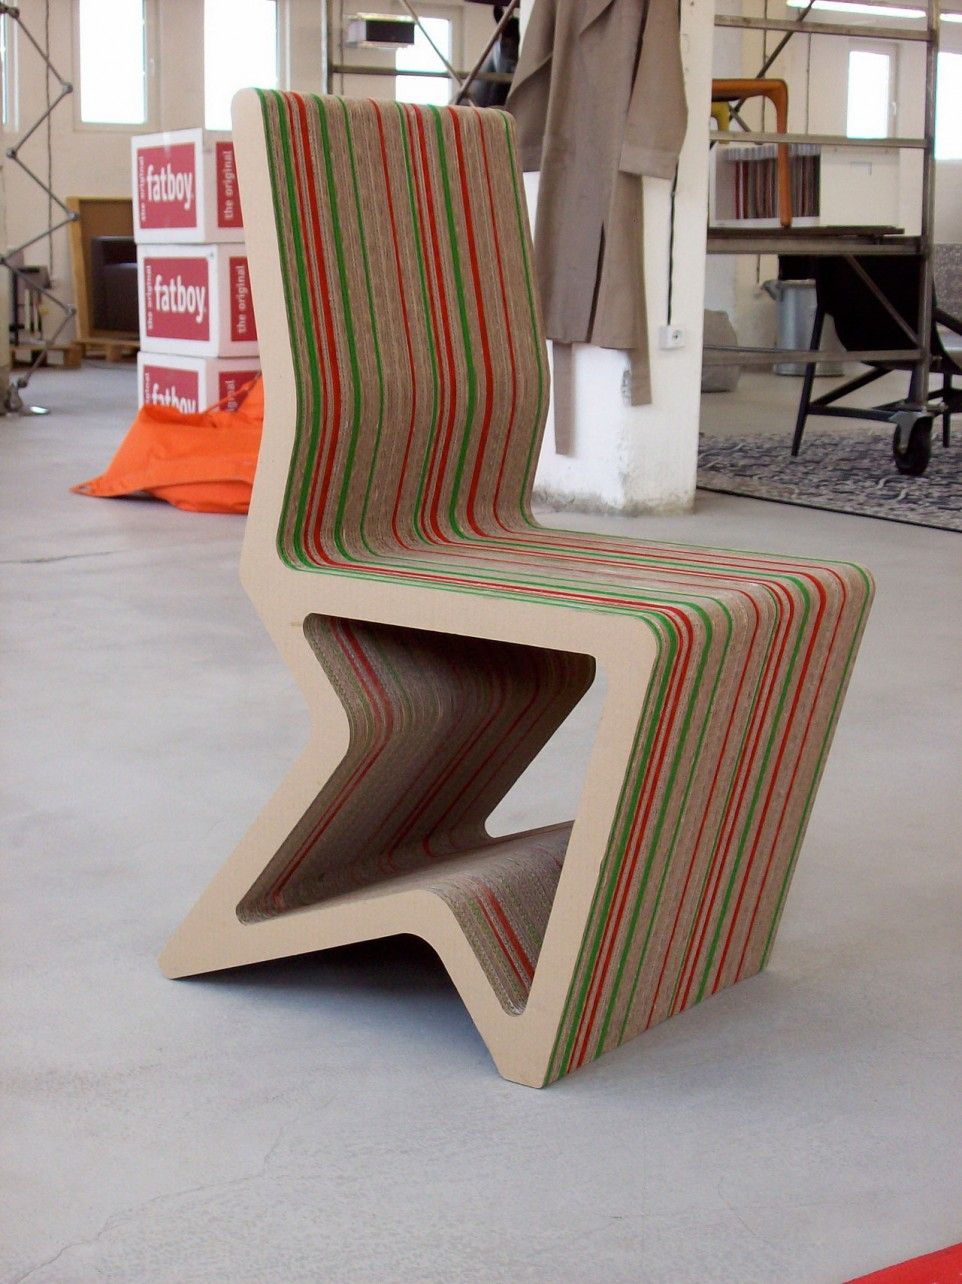 Unique chair designs - Cardboard Furniture Design For Unique Chair